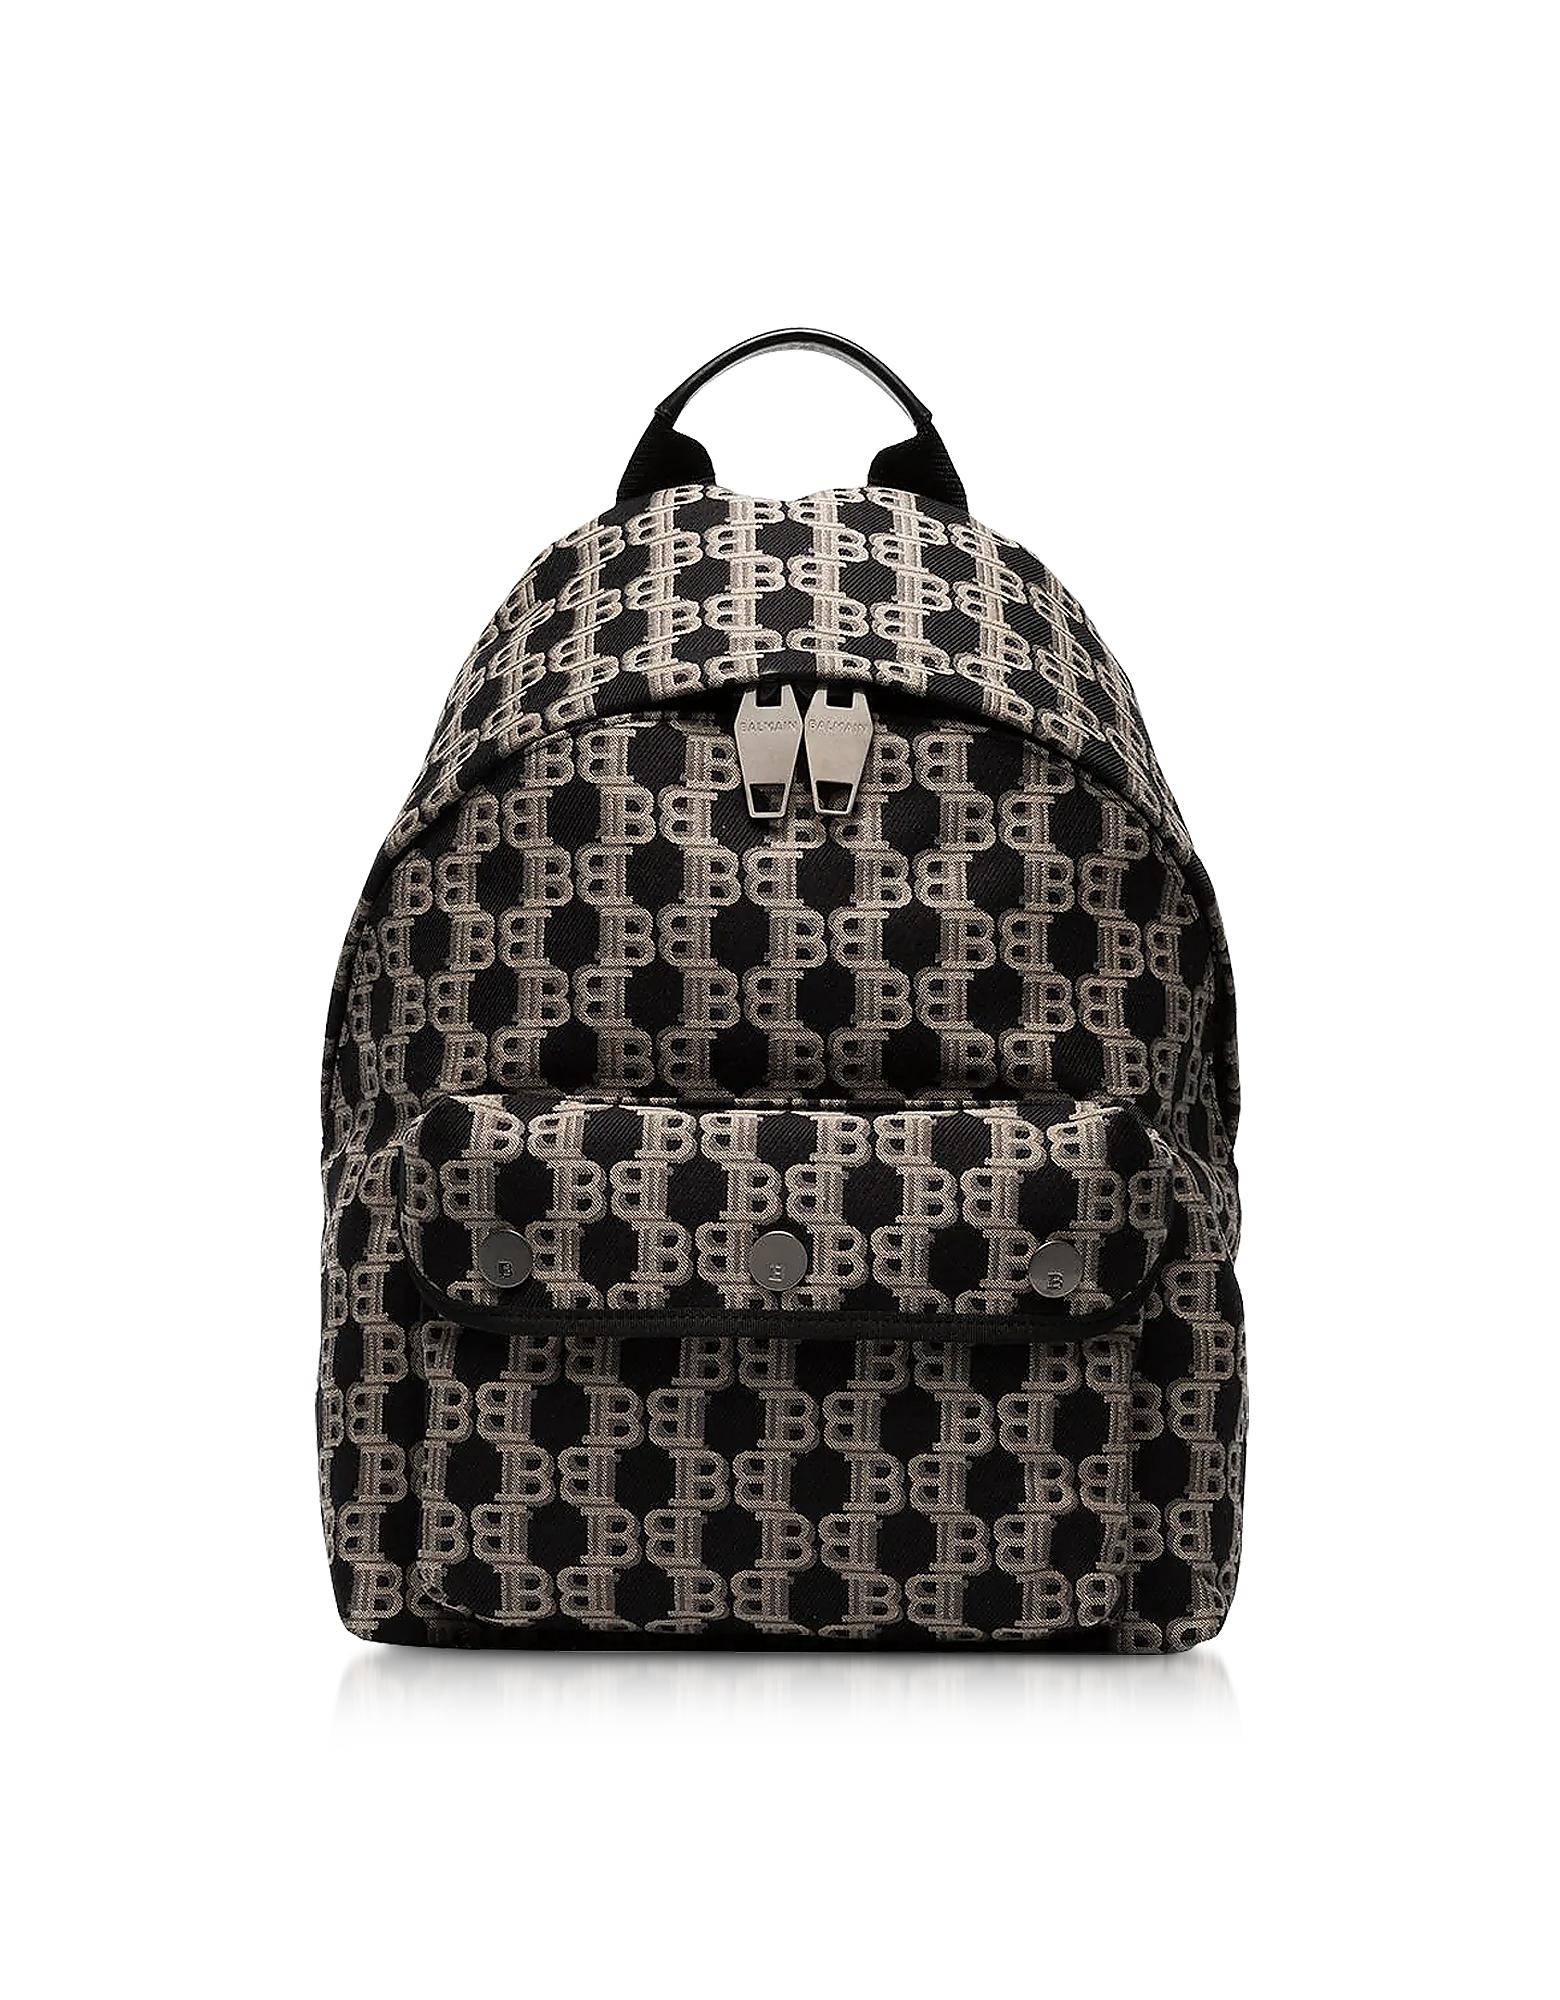 Balmain Designer Men's Bags, Beige and Black B-Backpack